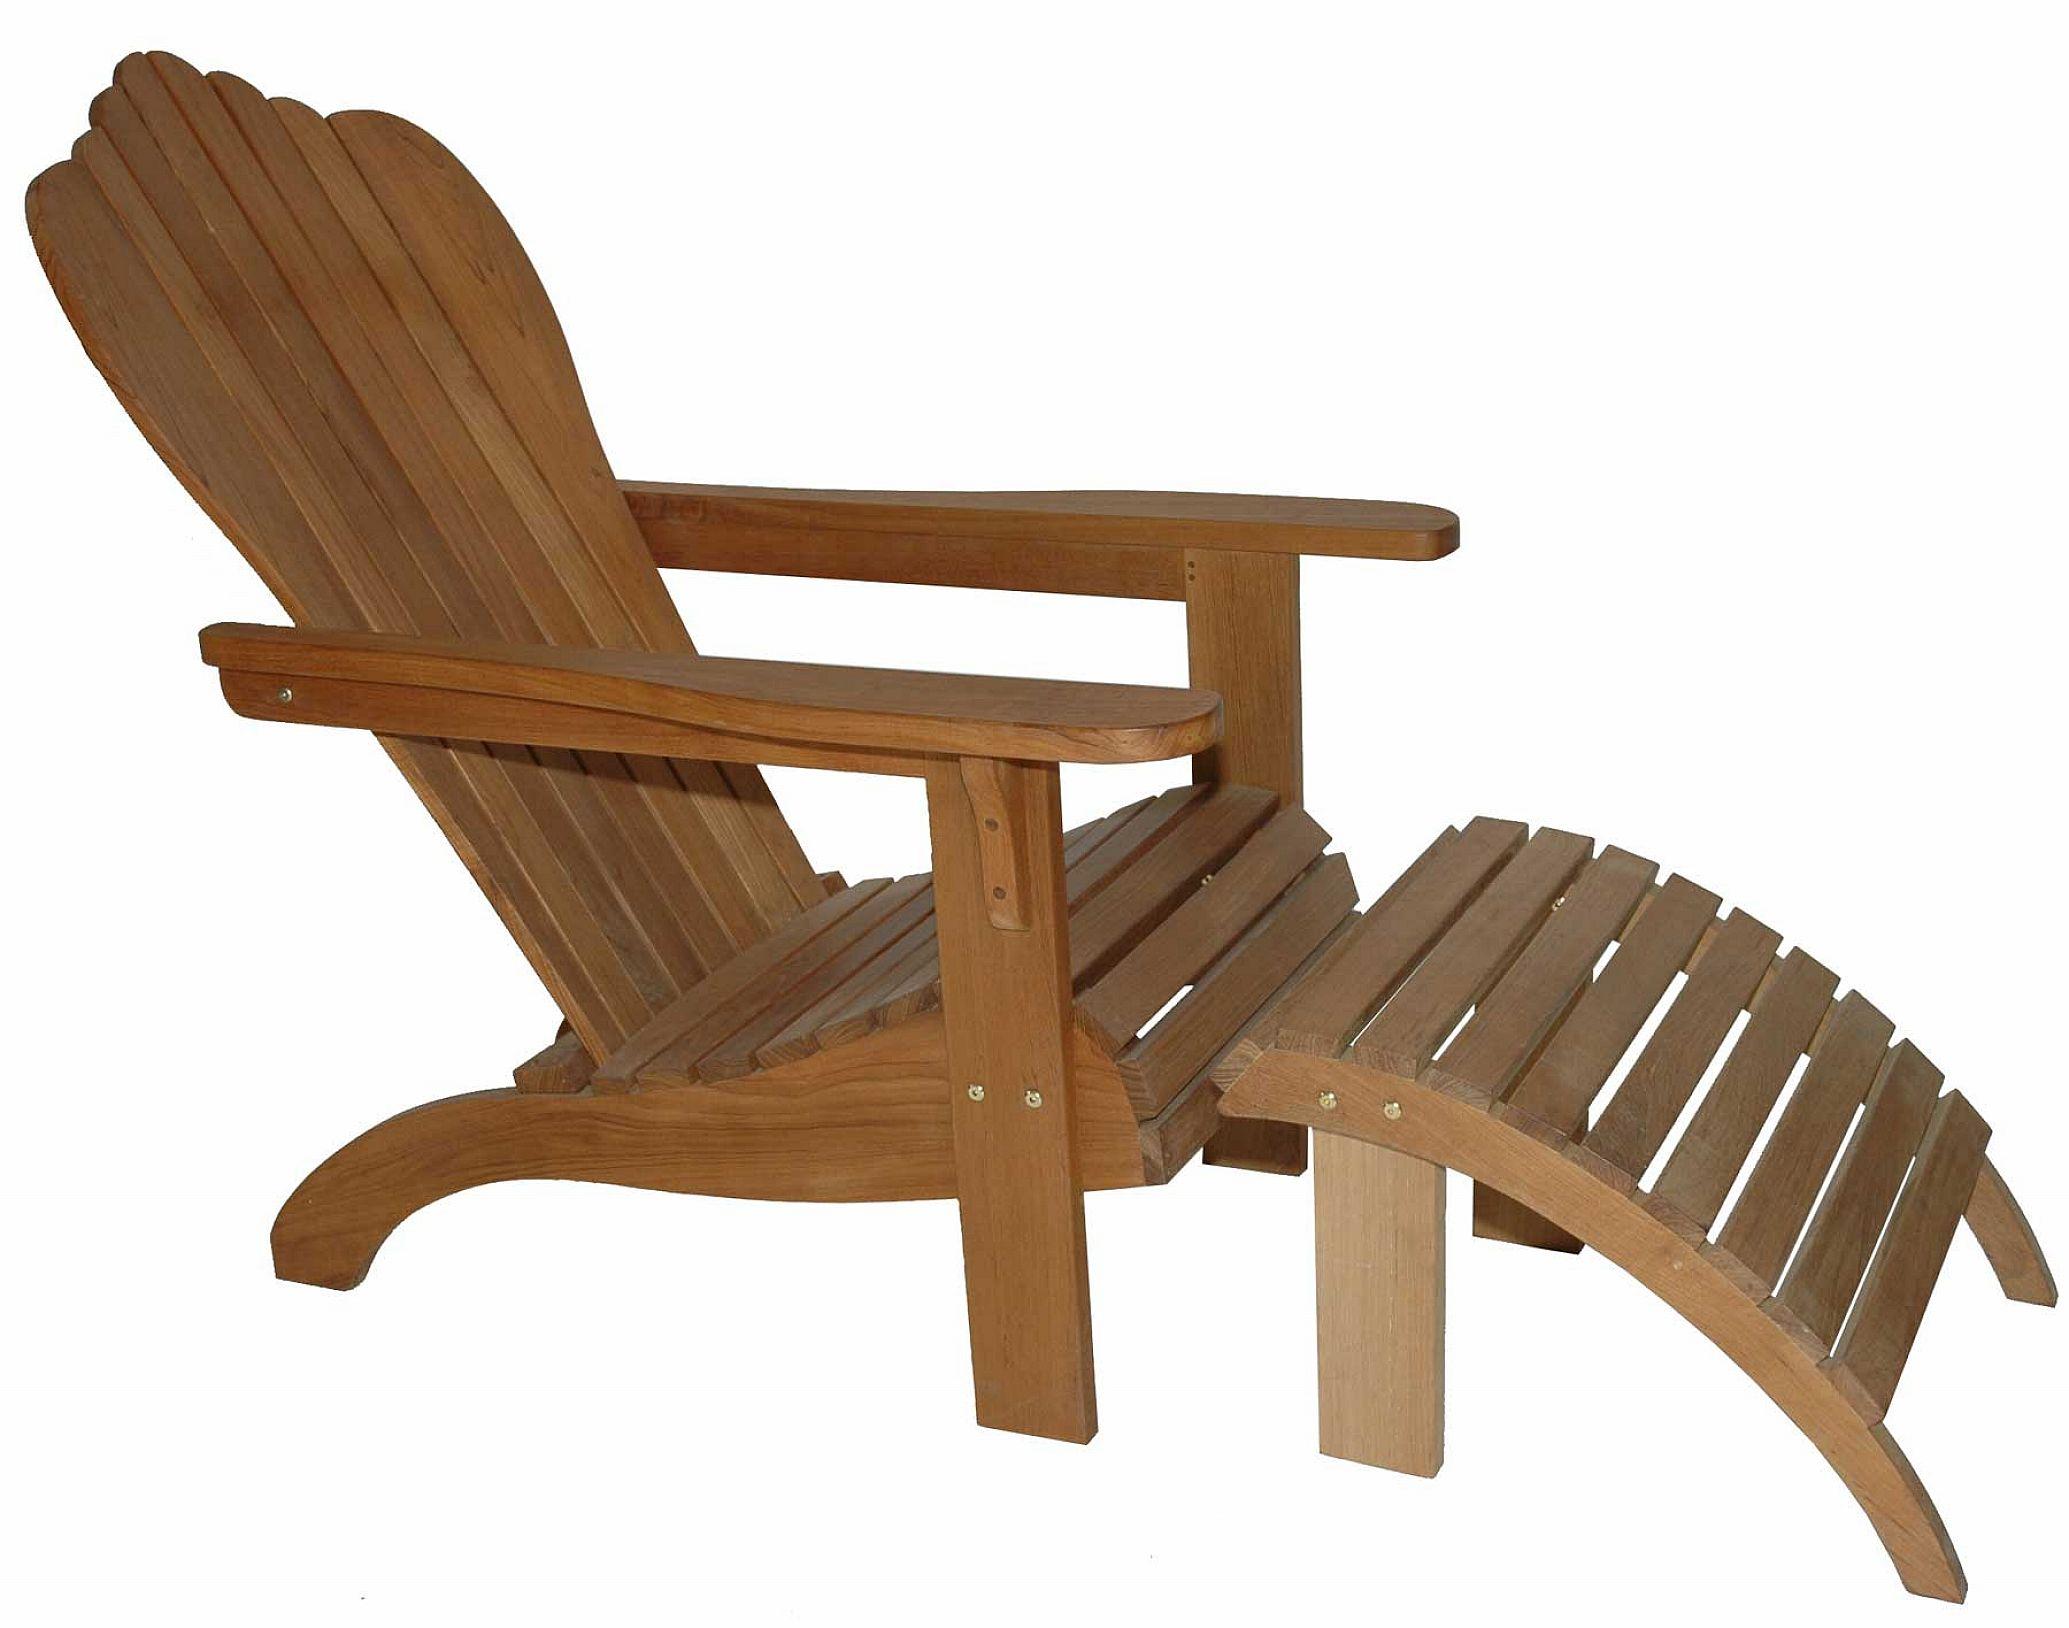 2069x1628 Adarondak Chairs